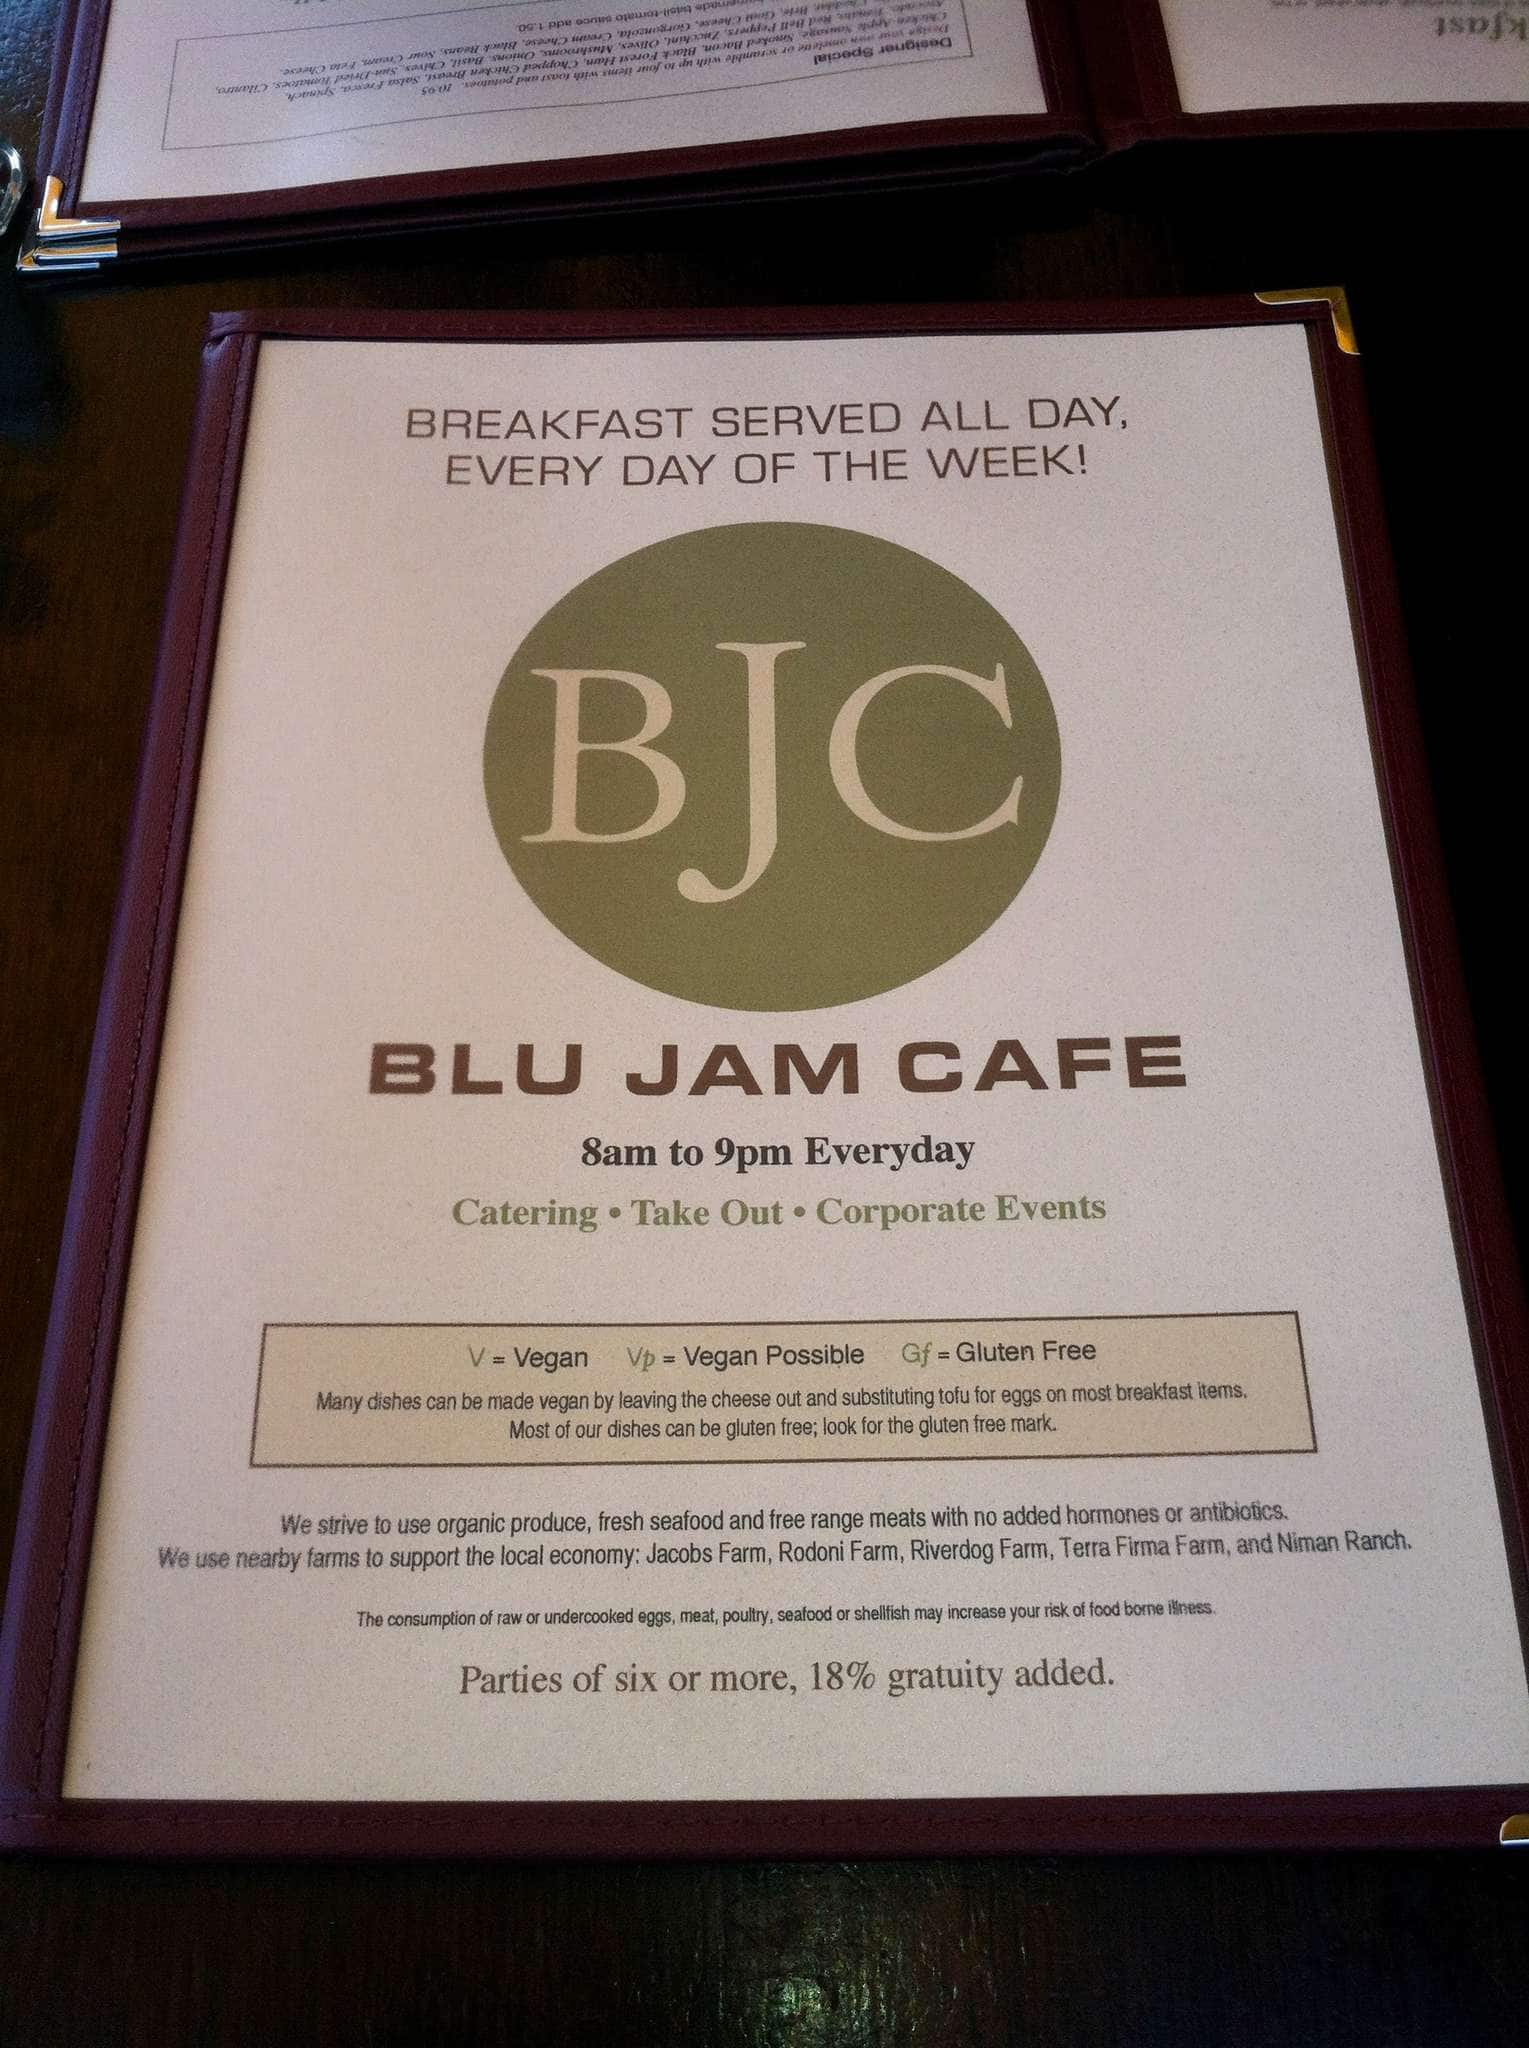 Blu Jam Cafe Breakfast Menu